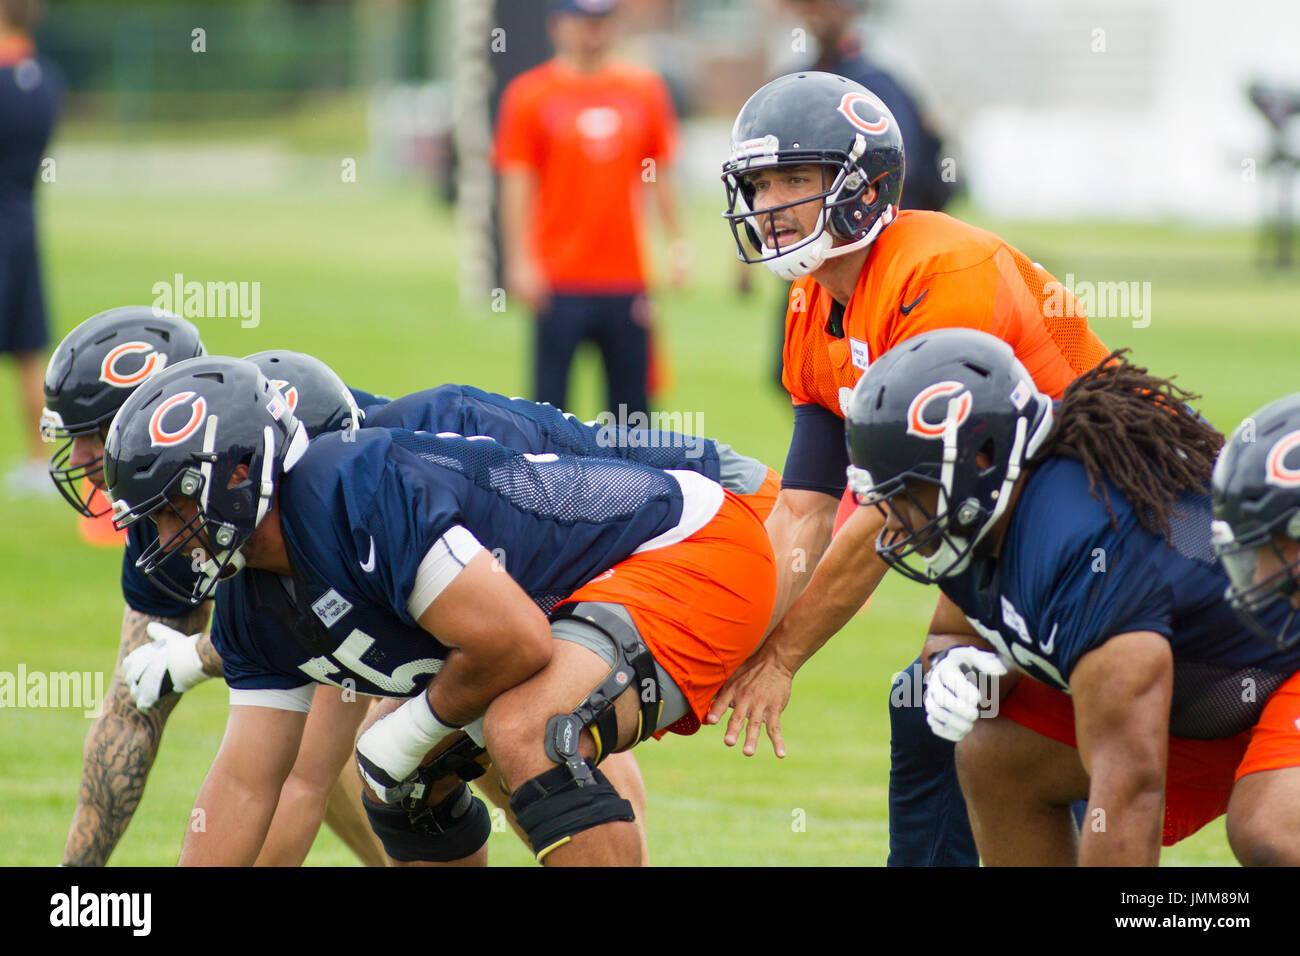 e2d382f6d8924d Bourbonnais, Illinois, USA. 27th July, 2017. - Chicago Bears Quarterback #